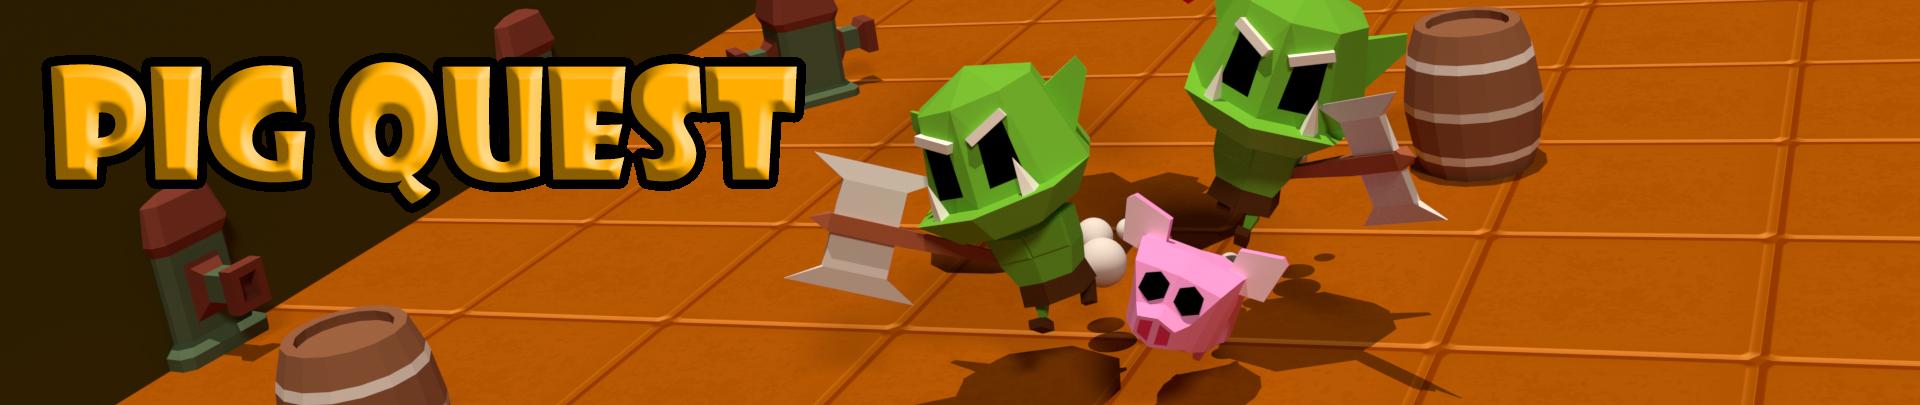 Pig Quest